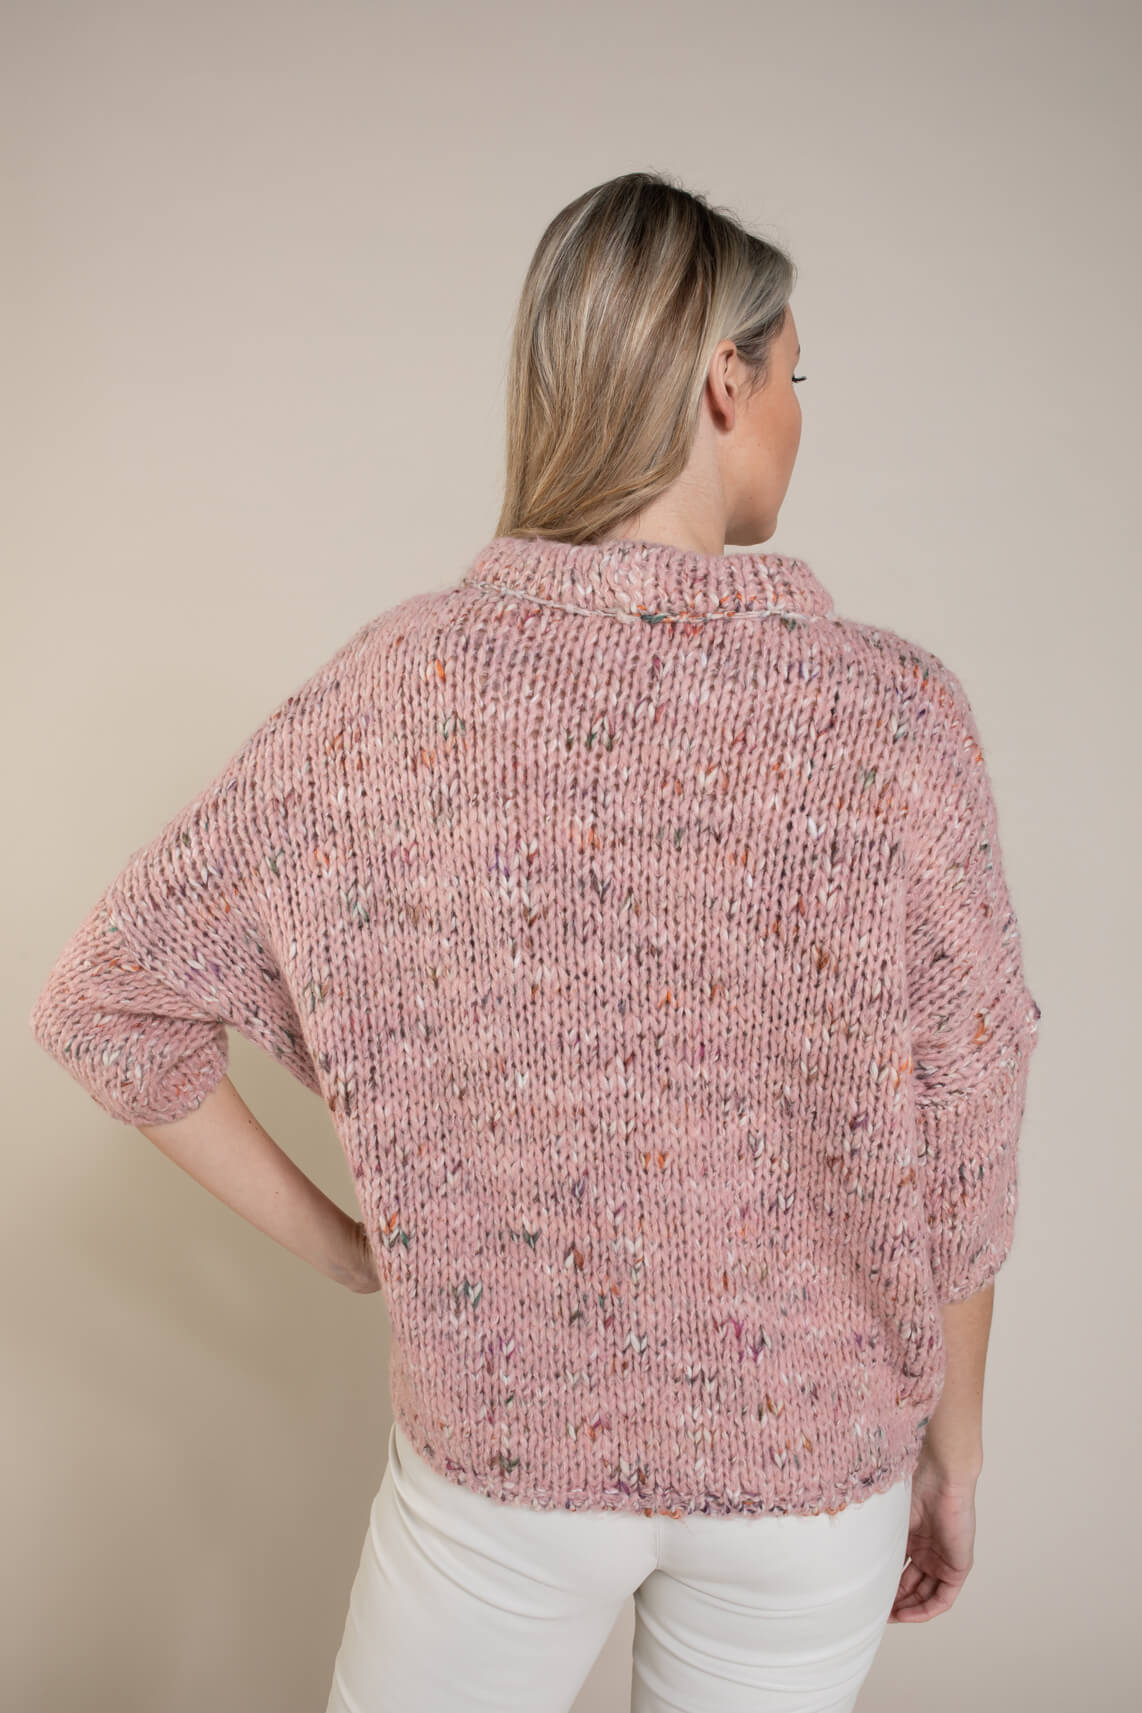 La Fée Maraboutée Dames Kleurrijke pullover roze